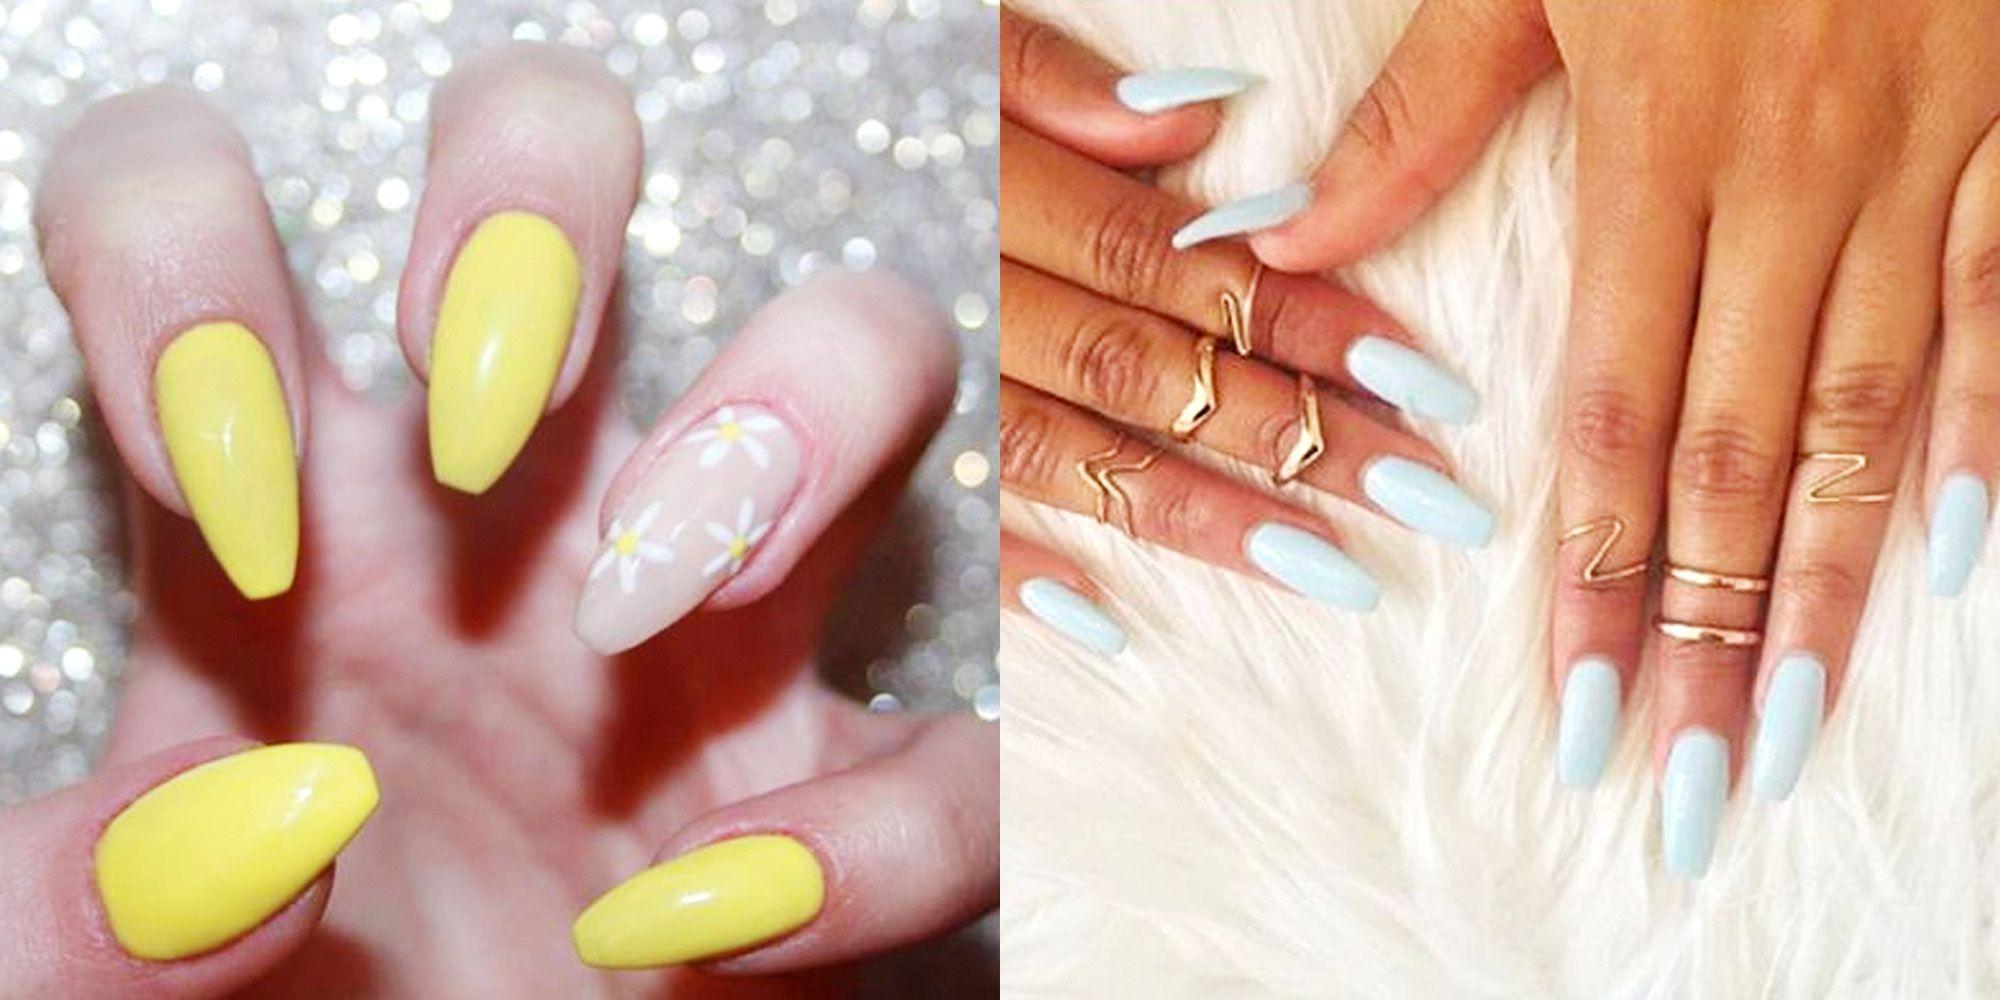 skin acrylic nails photo - 1